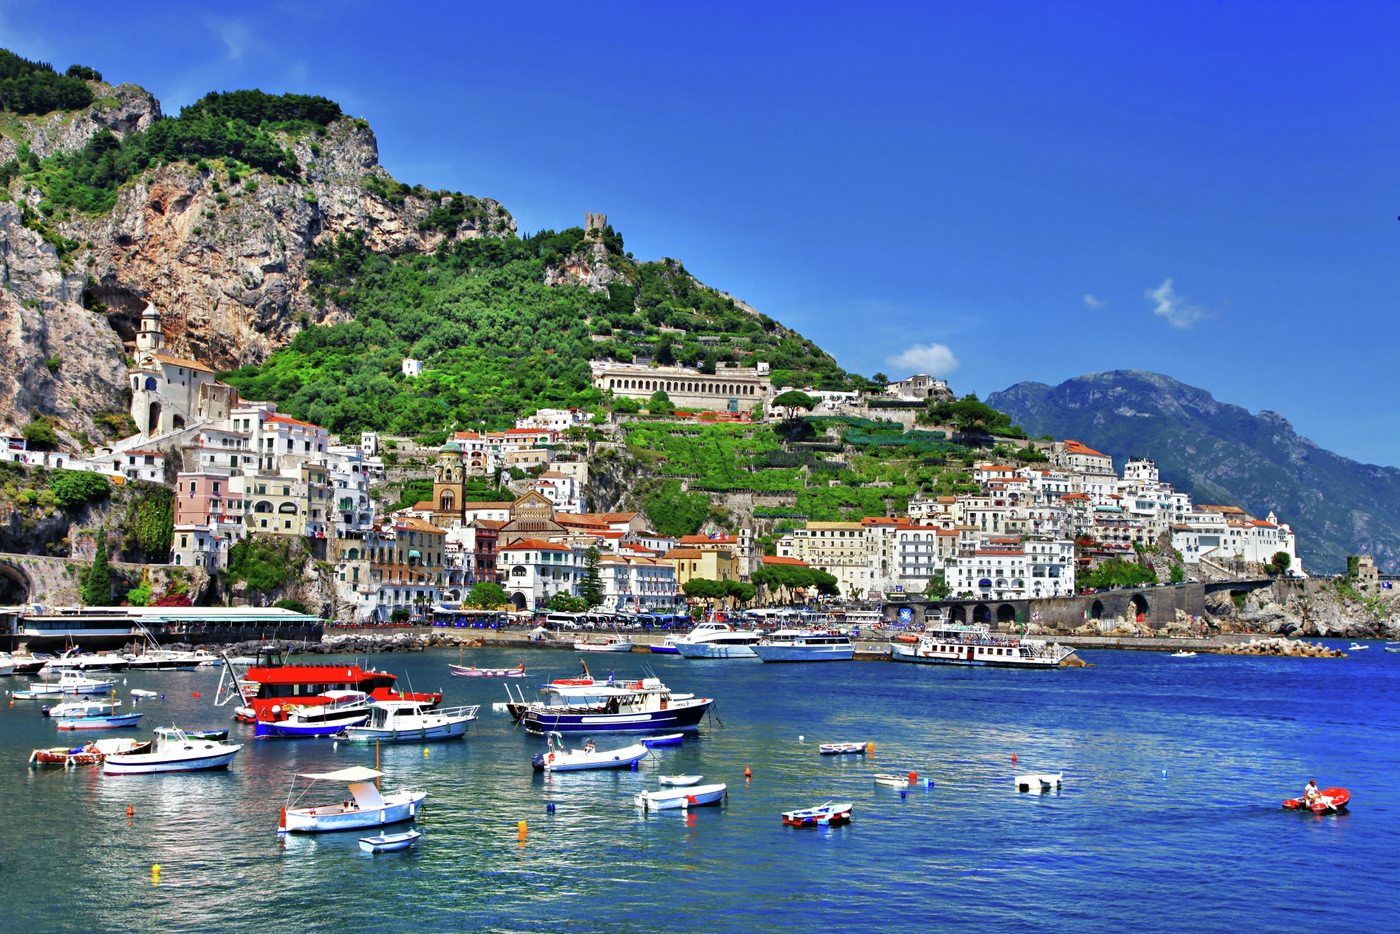 Photo Tour of Amalfi Coast 1